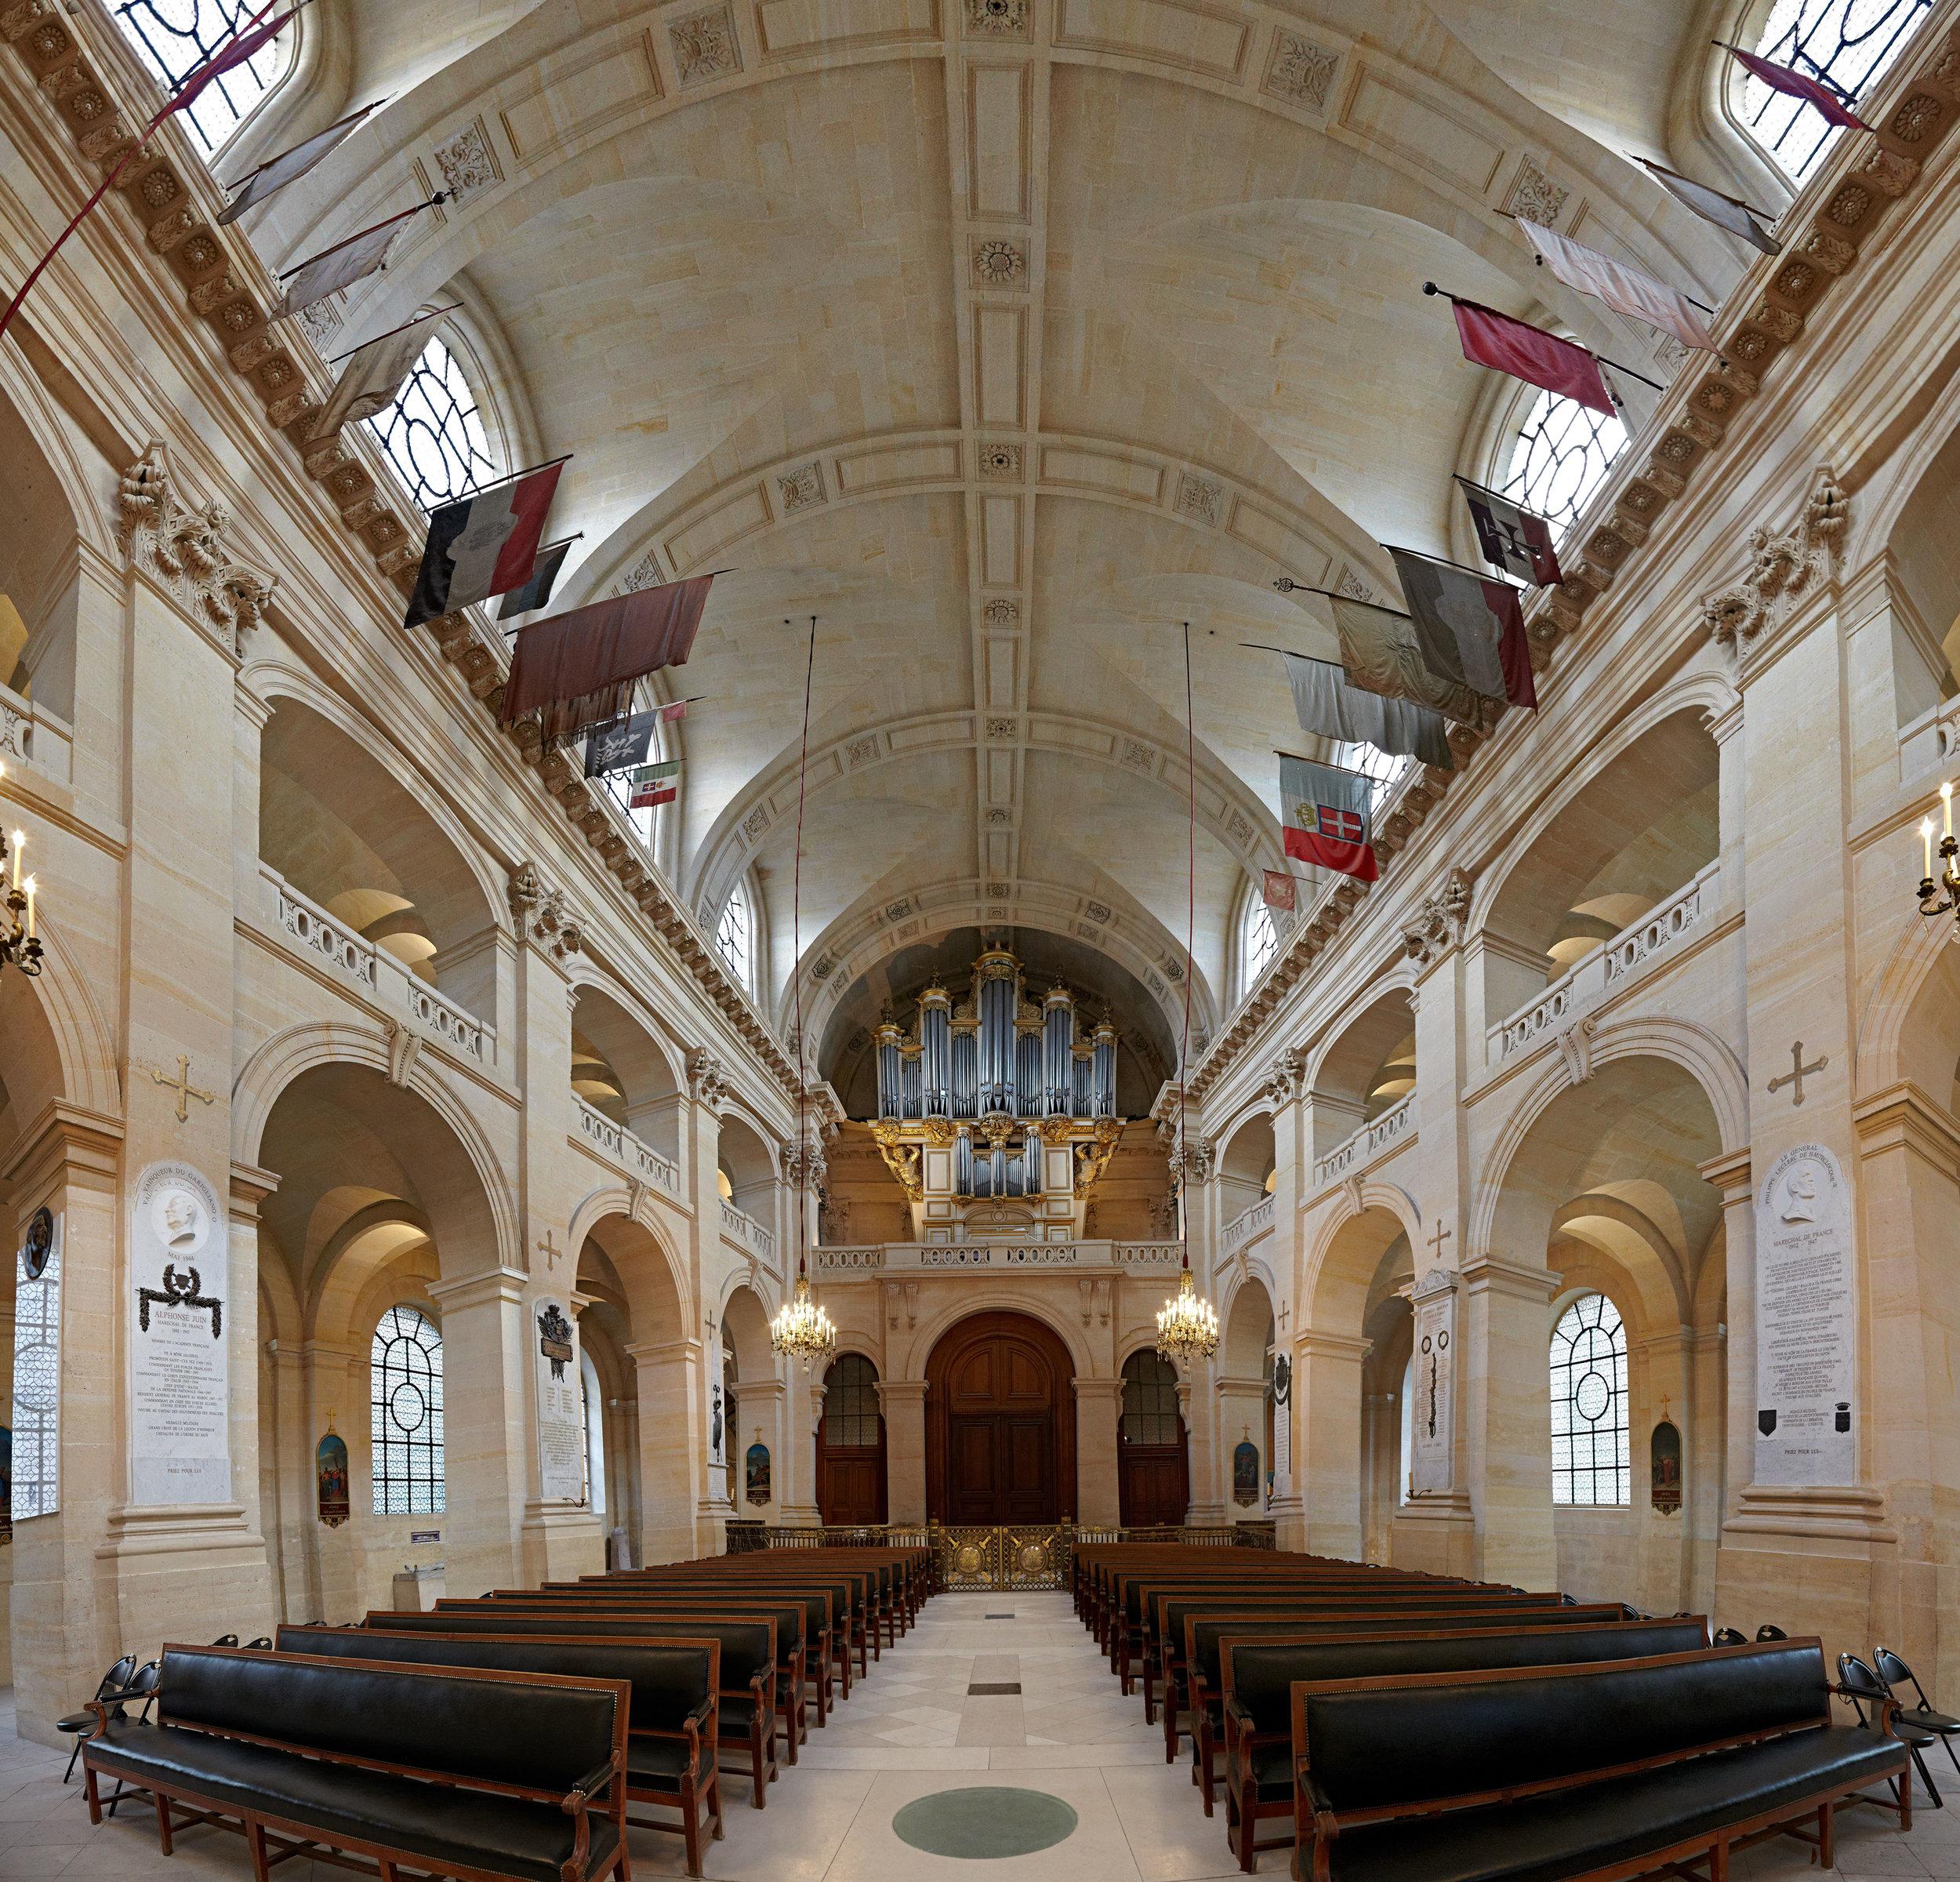 Cathedrale des Invalides